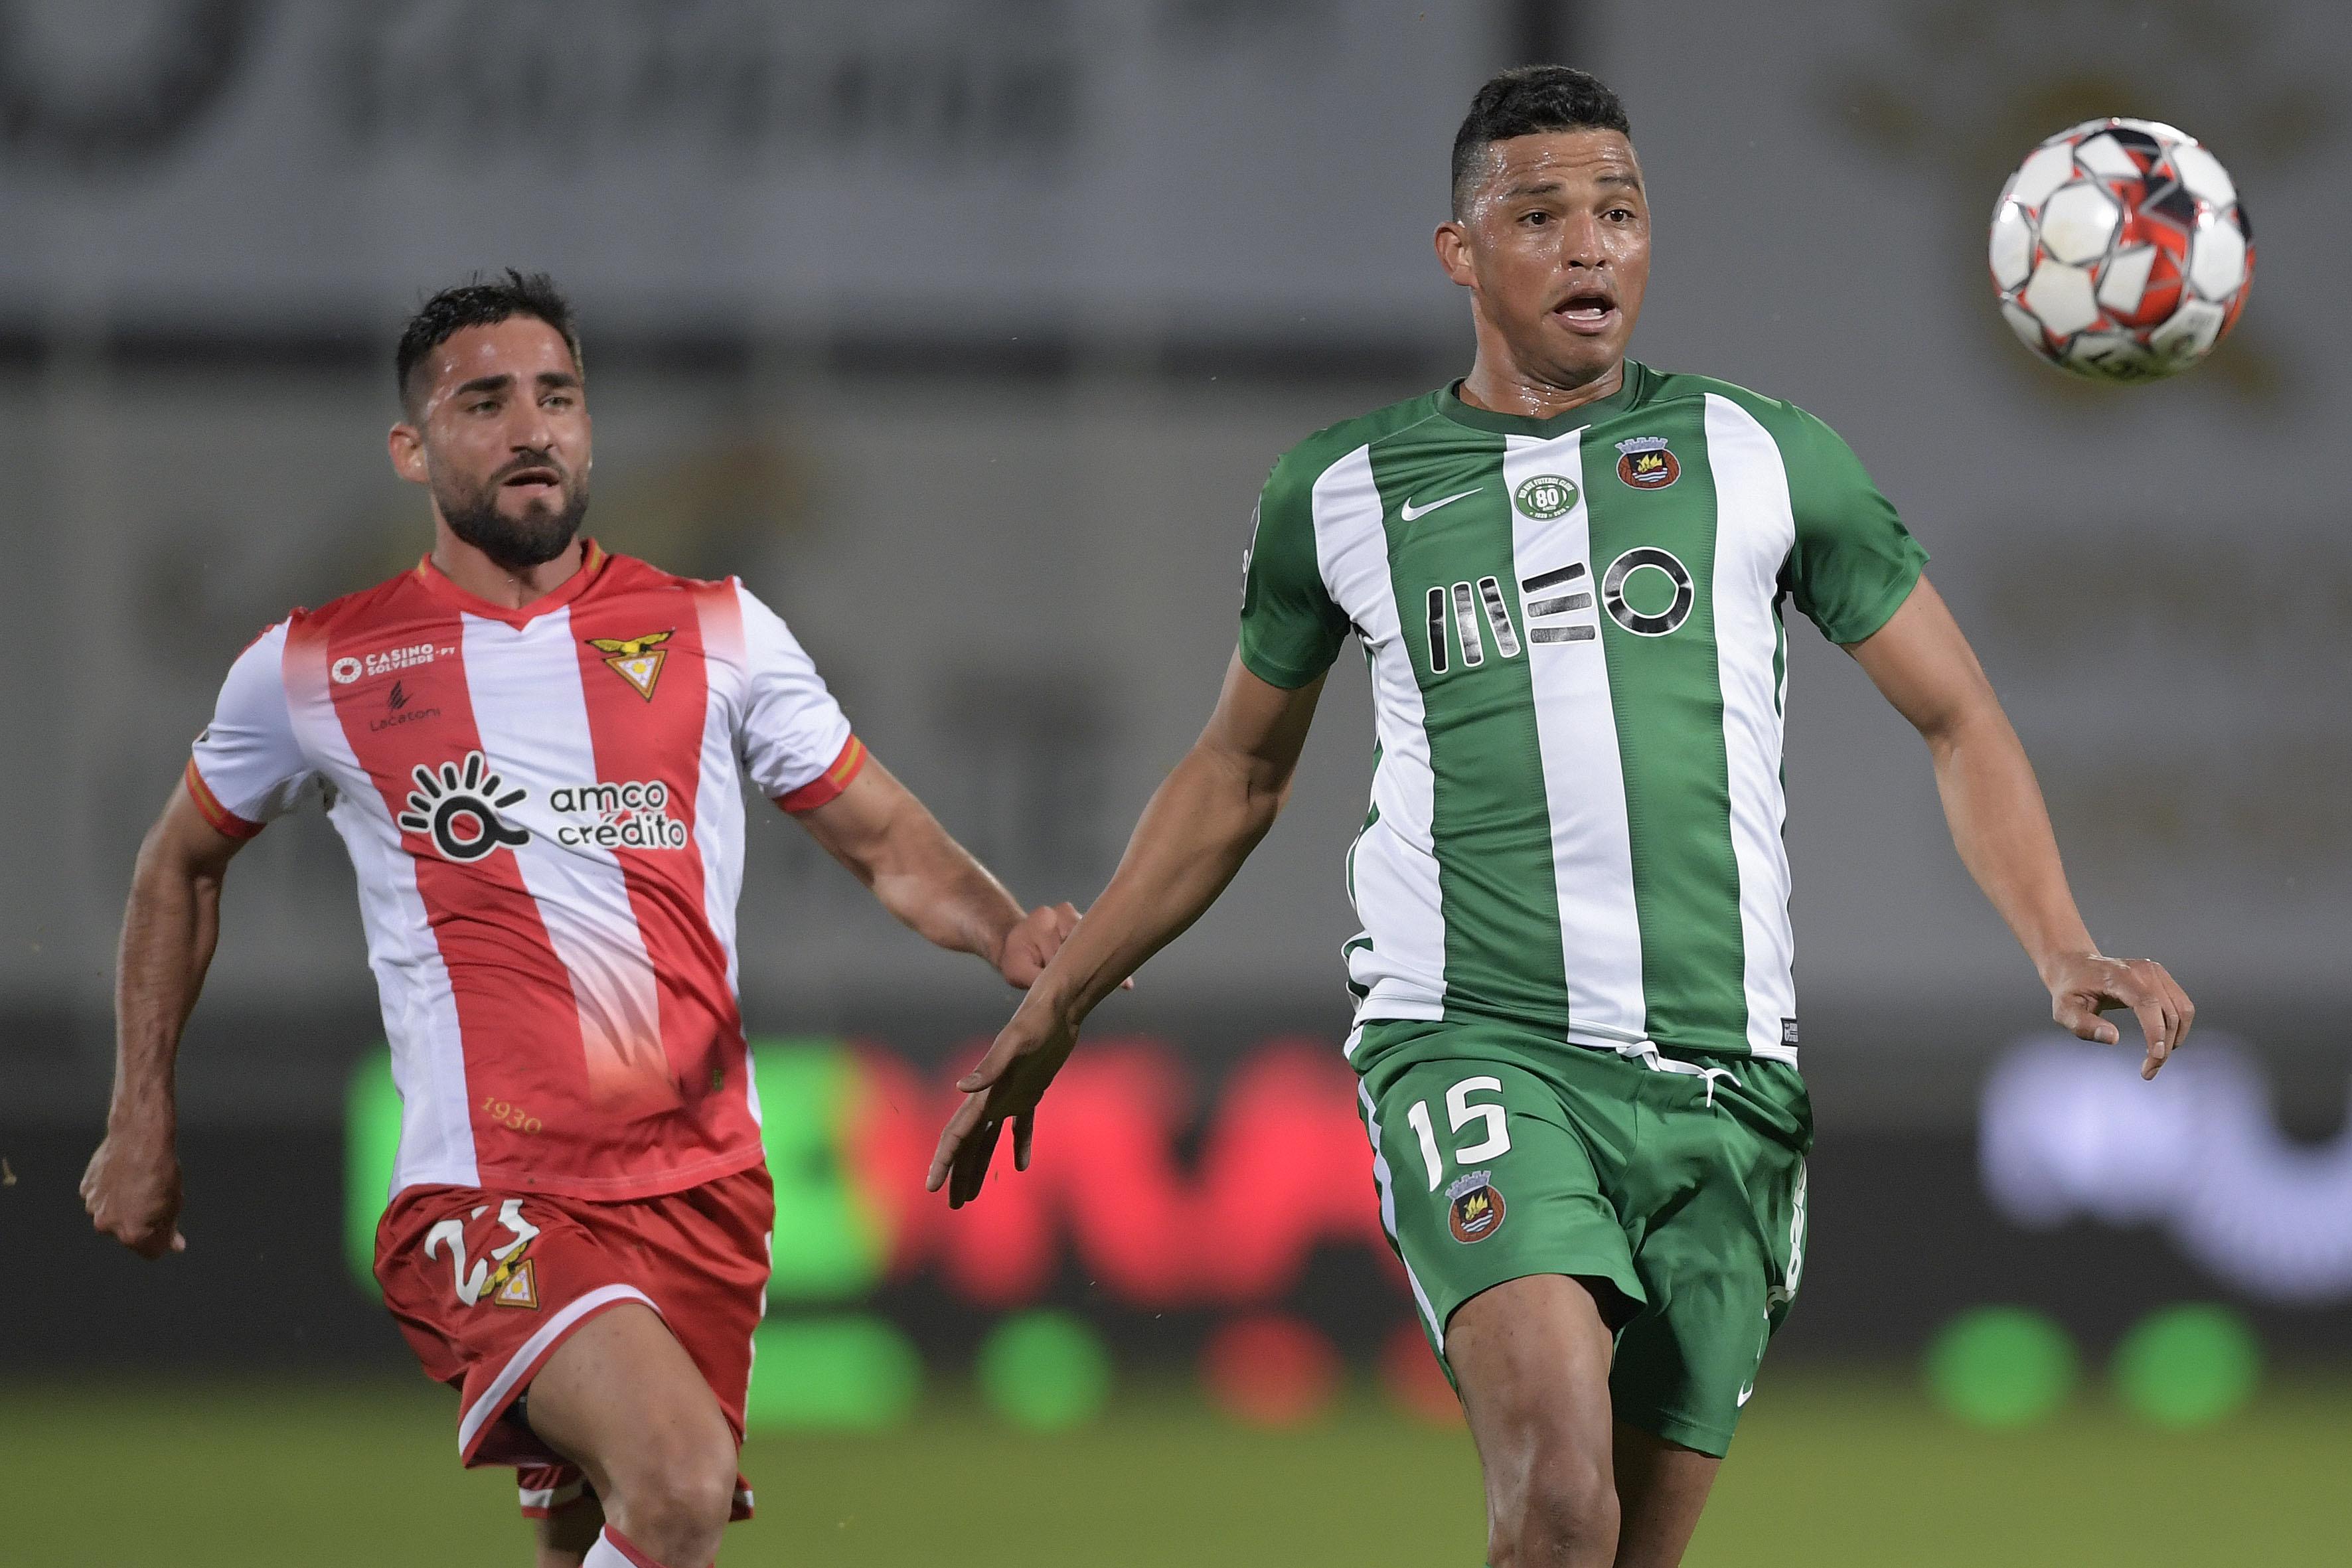 Rio Ave assegura defesa Aderllan Santos por duas temporadas